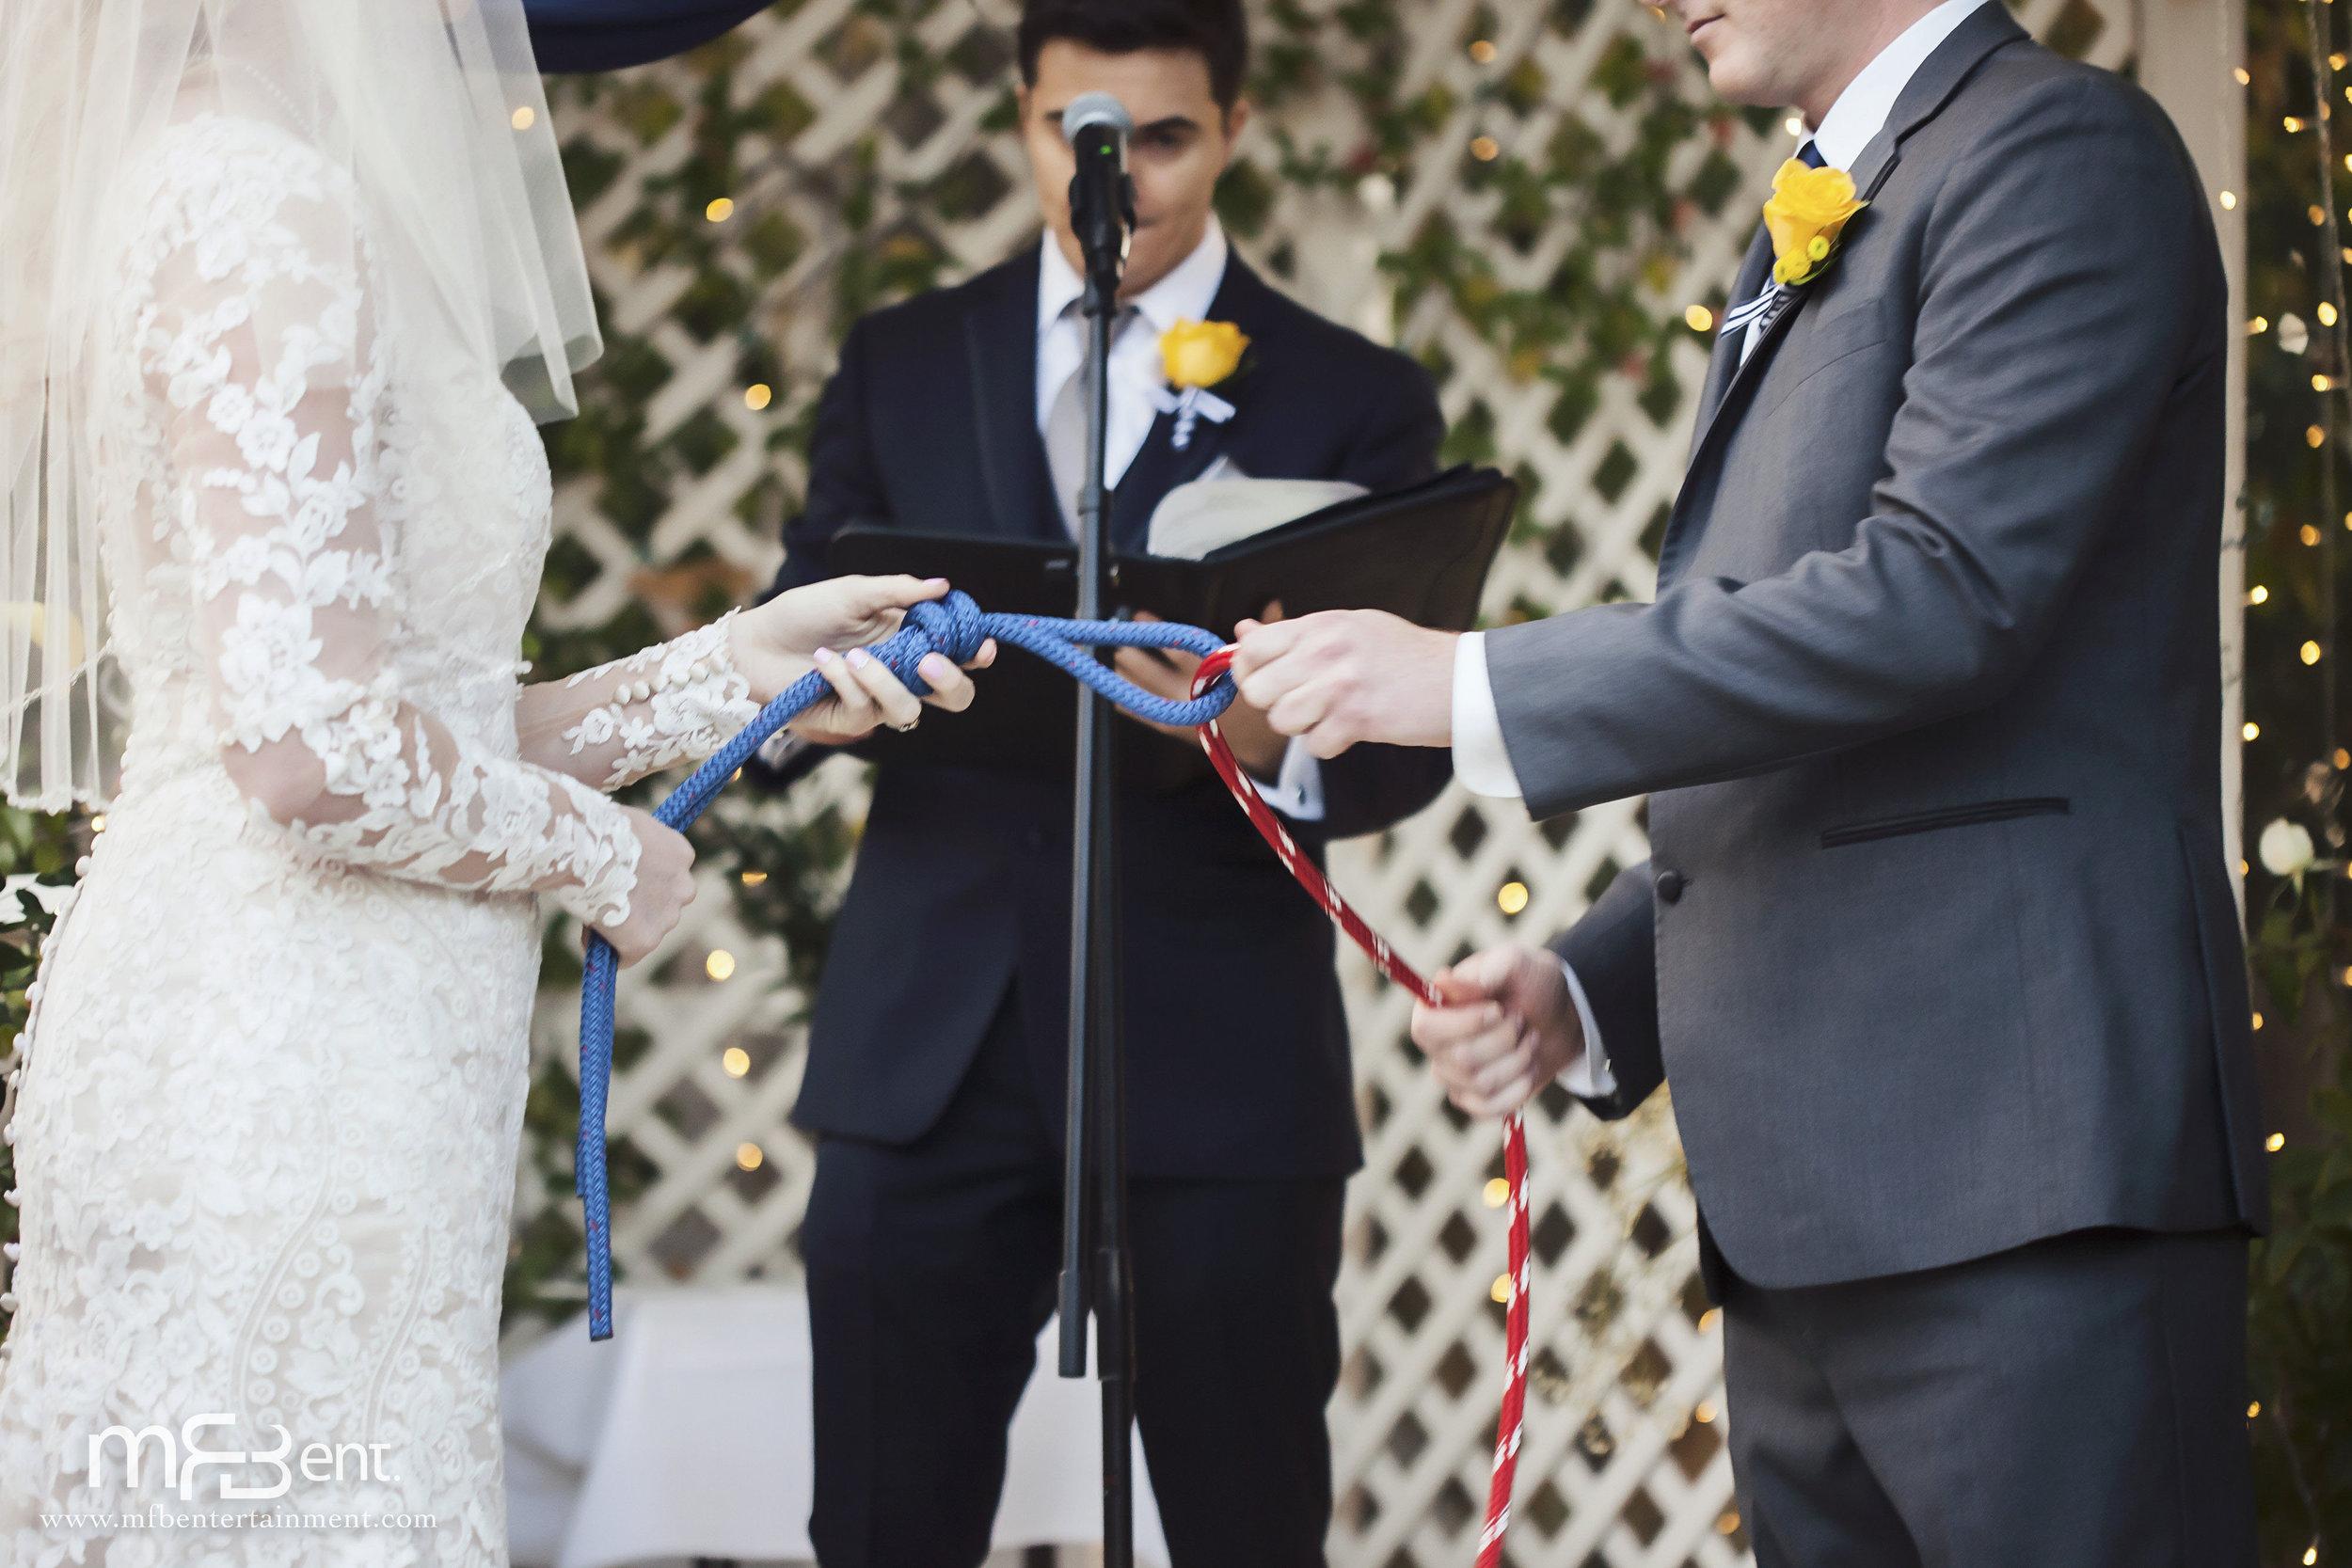 PIOTR CHELSEA WEDDING-CEREMONY-0116 L.jpg